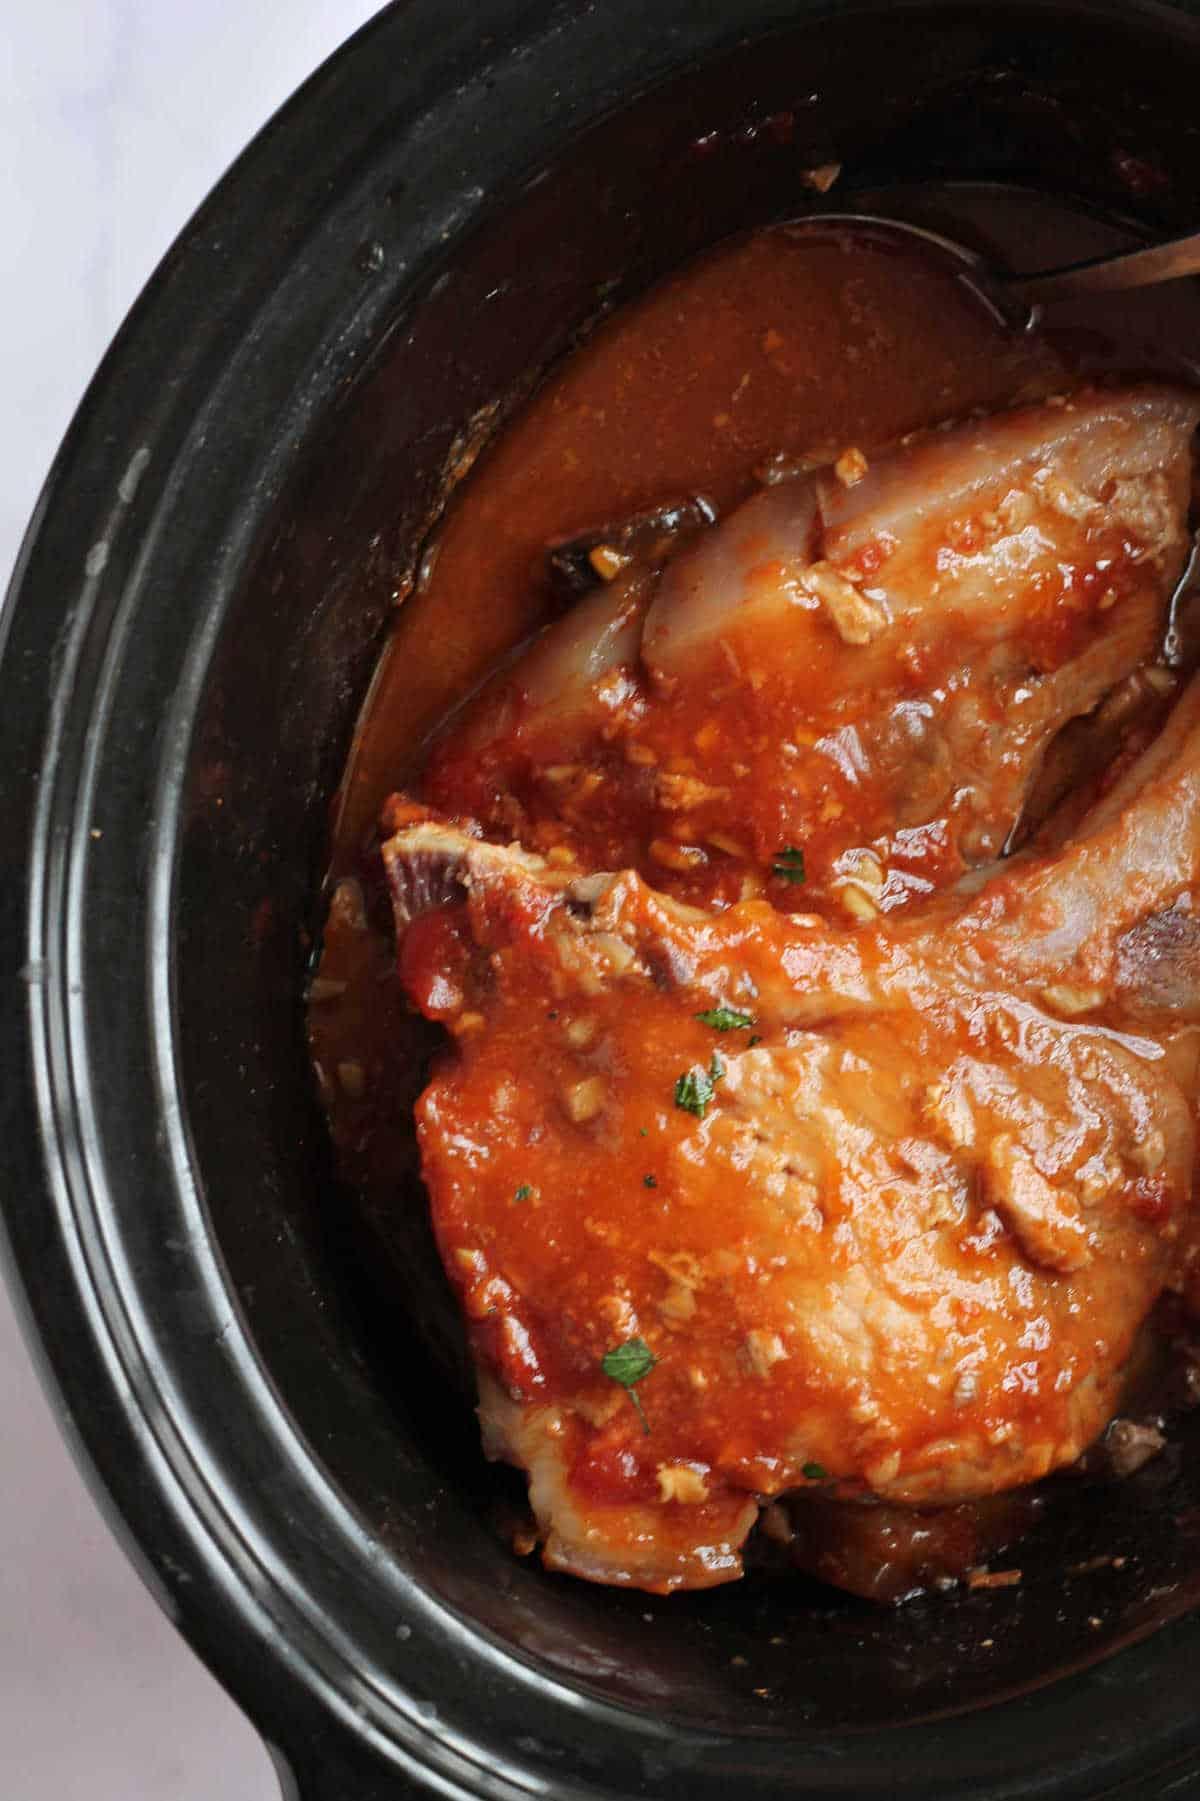 Slow cooker with honey garlic pork chops.